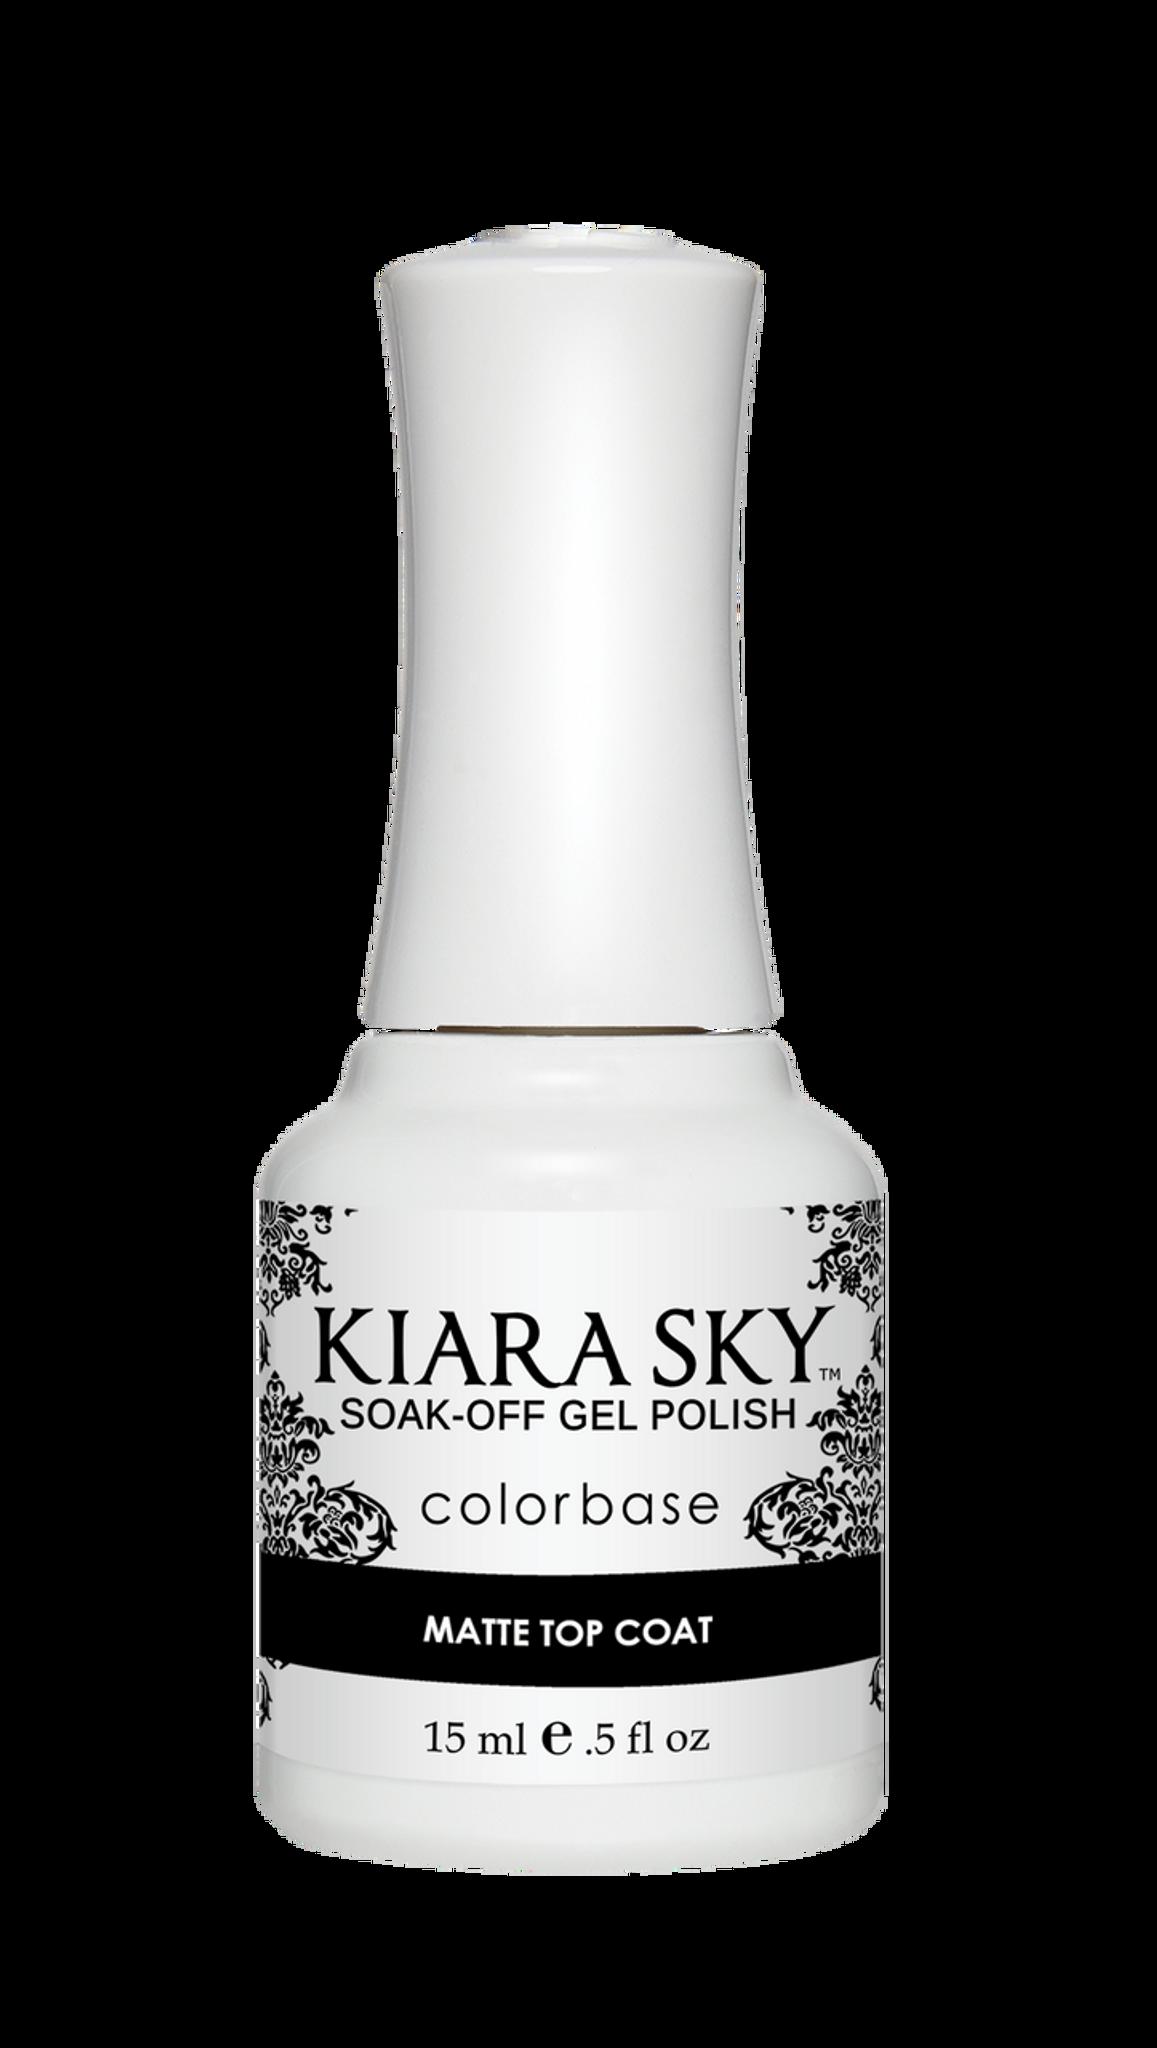 GEL POLISH - MATTE COAT - Kiara Sky Professional Nails